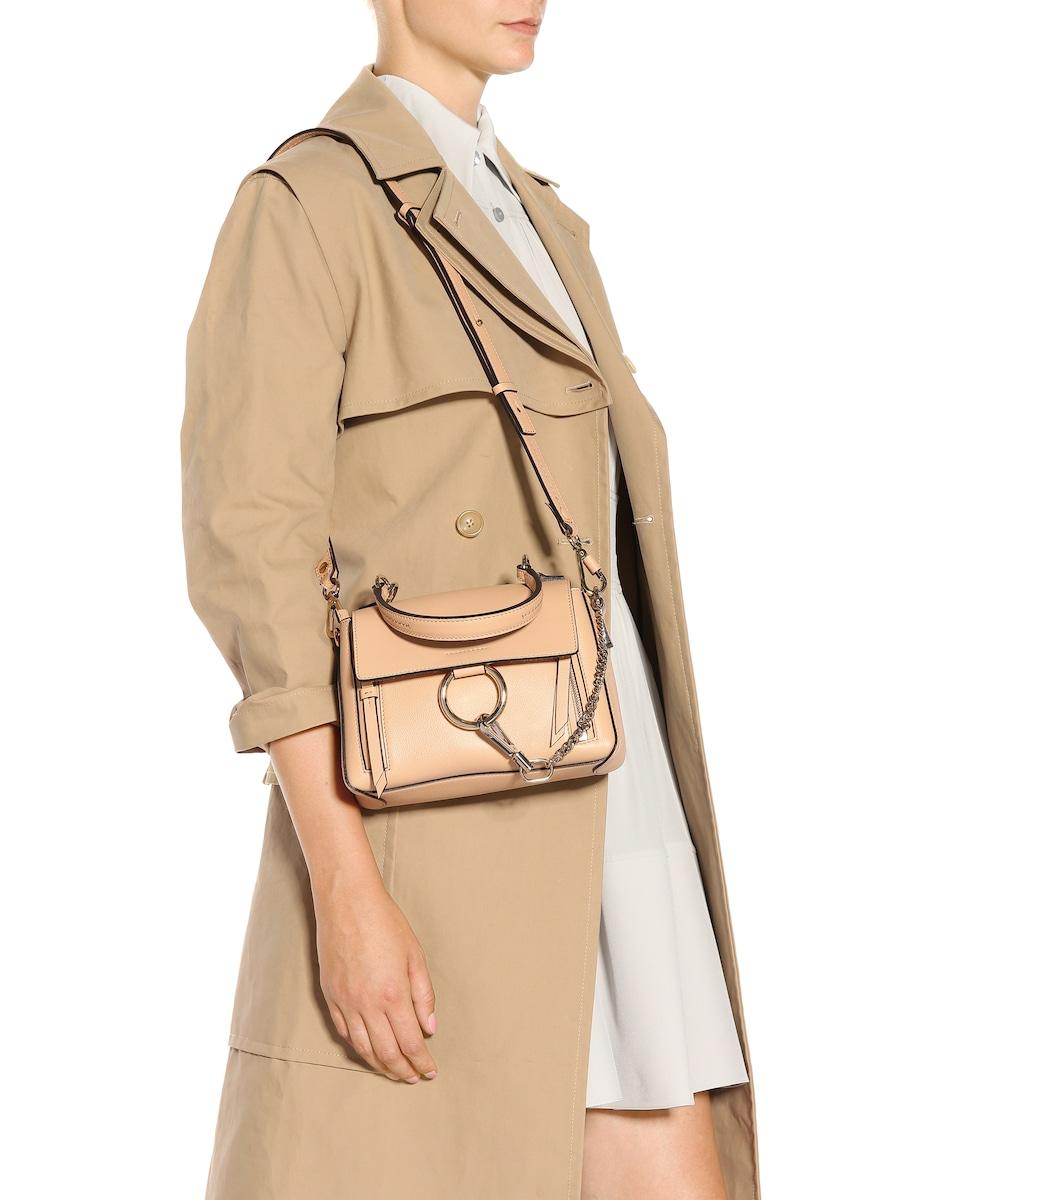 737b0b36c Mini Faye Day Leather Shoulder Bag   Chloé - mytheresa.com